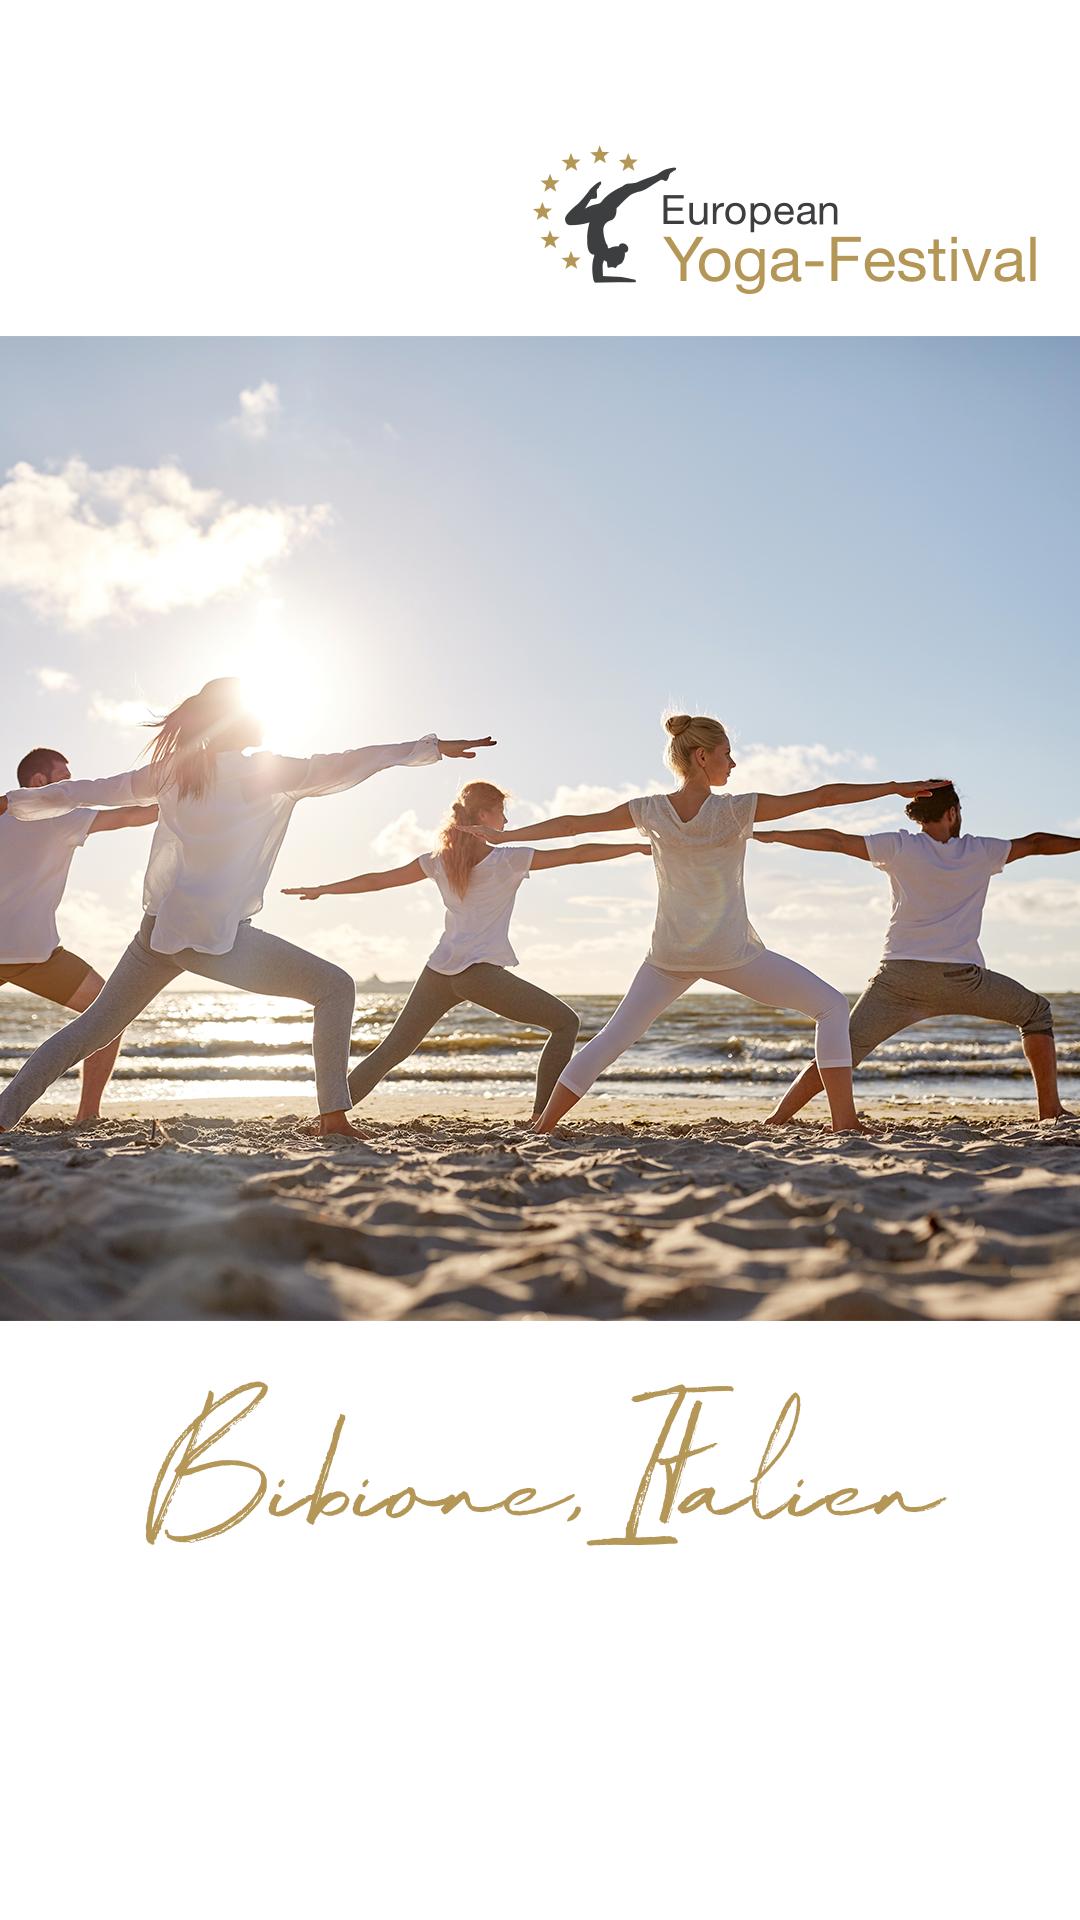 European Yoga-Festival in Bibione